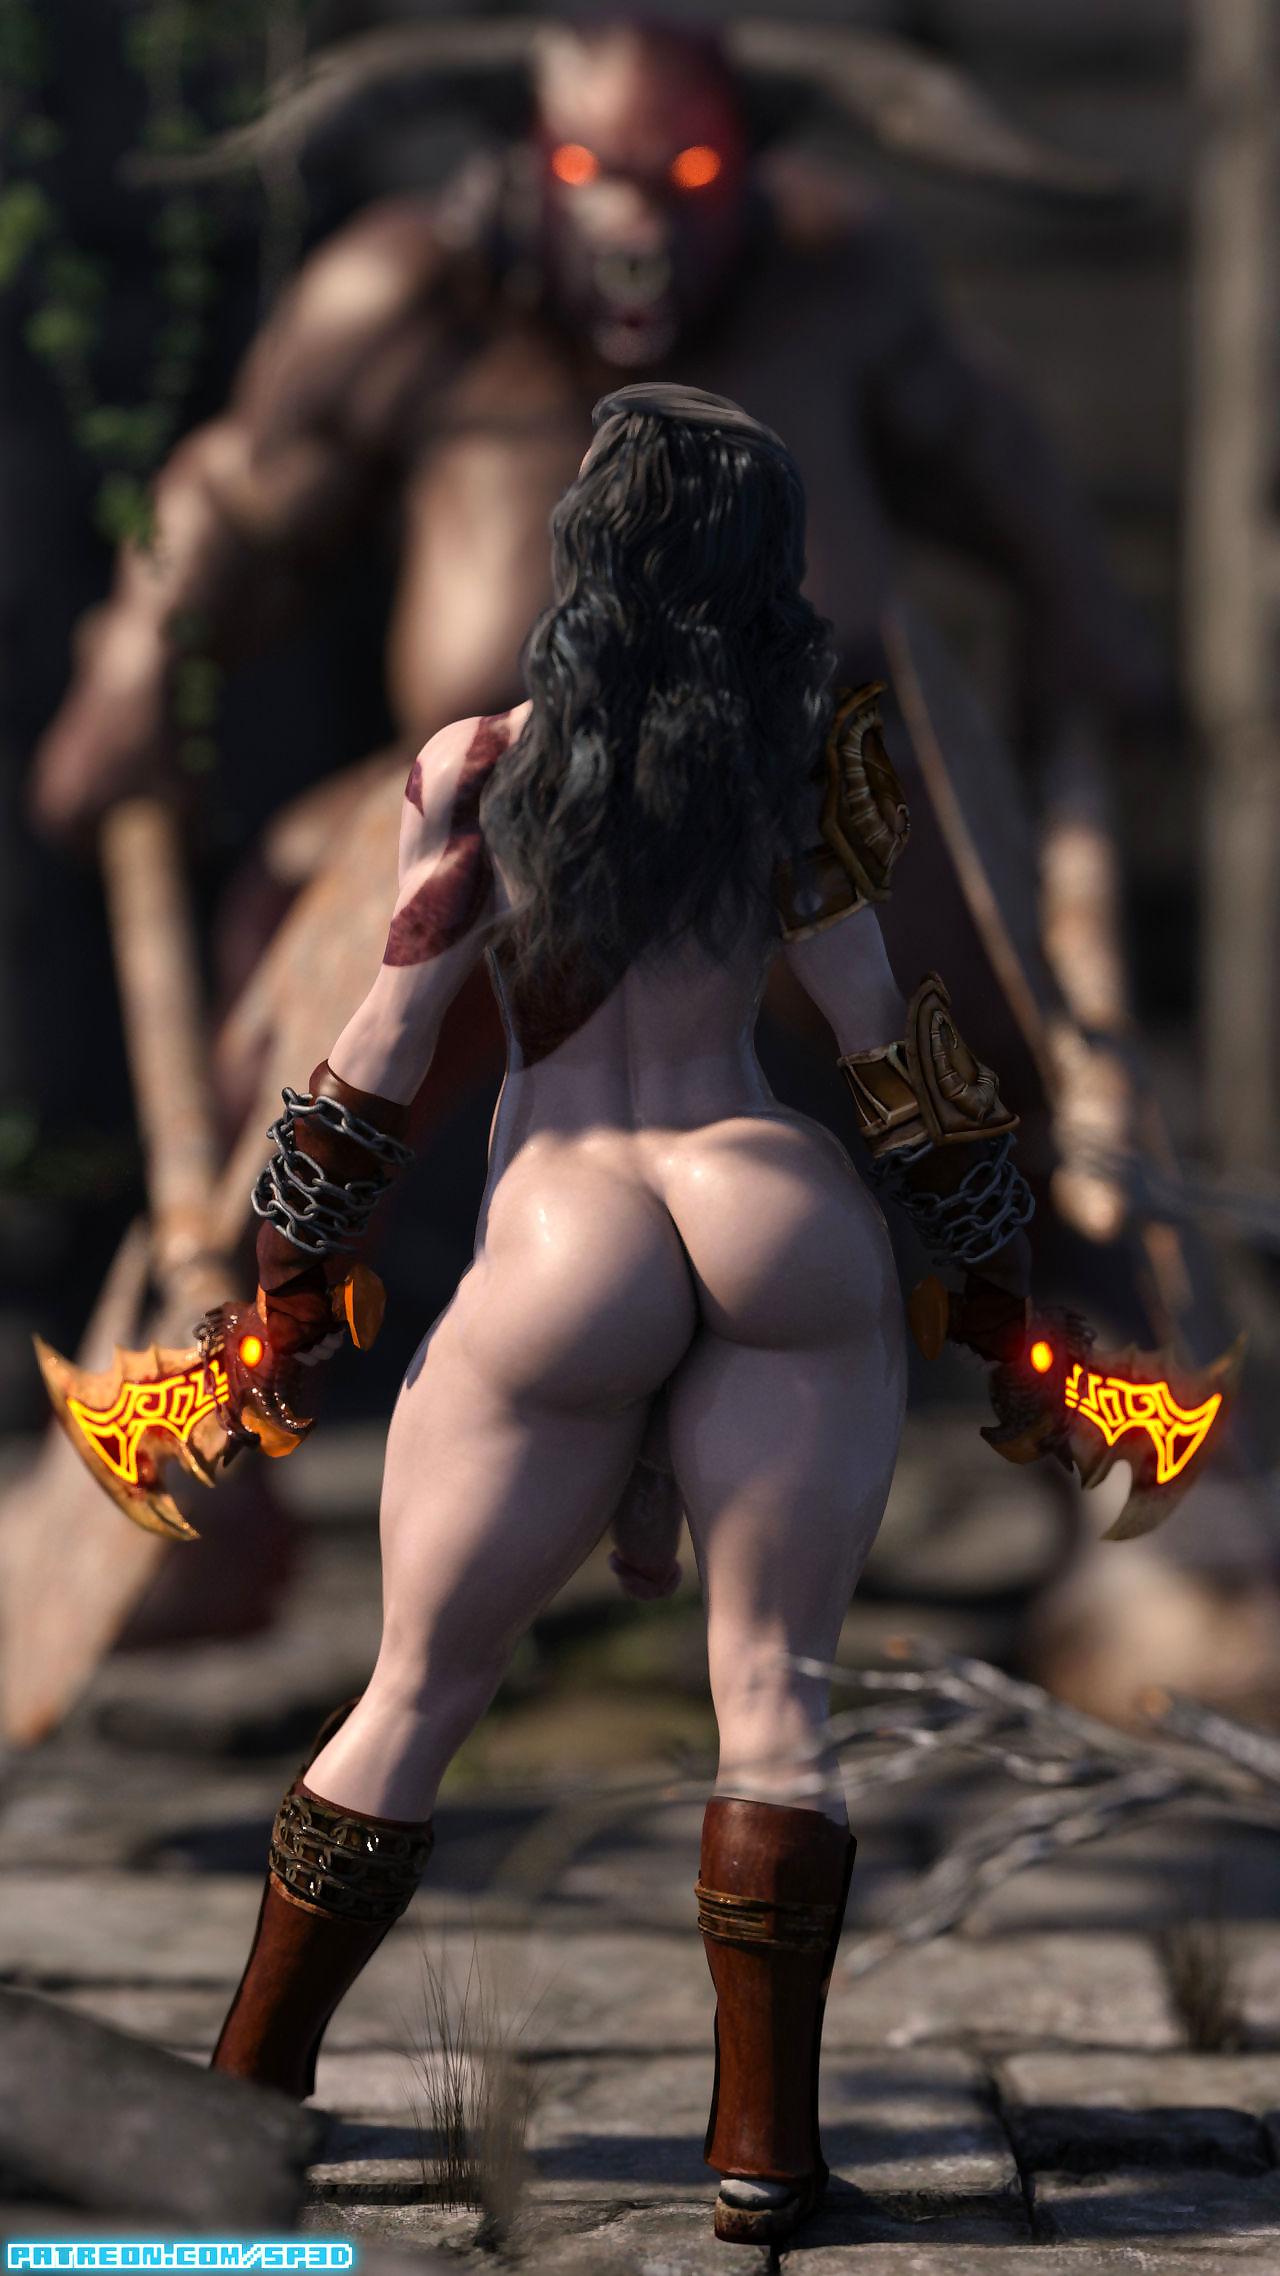 Agent Whore squarepeg3d-krata – goddess of whore 3d porn pics